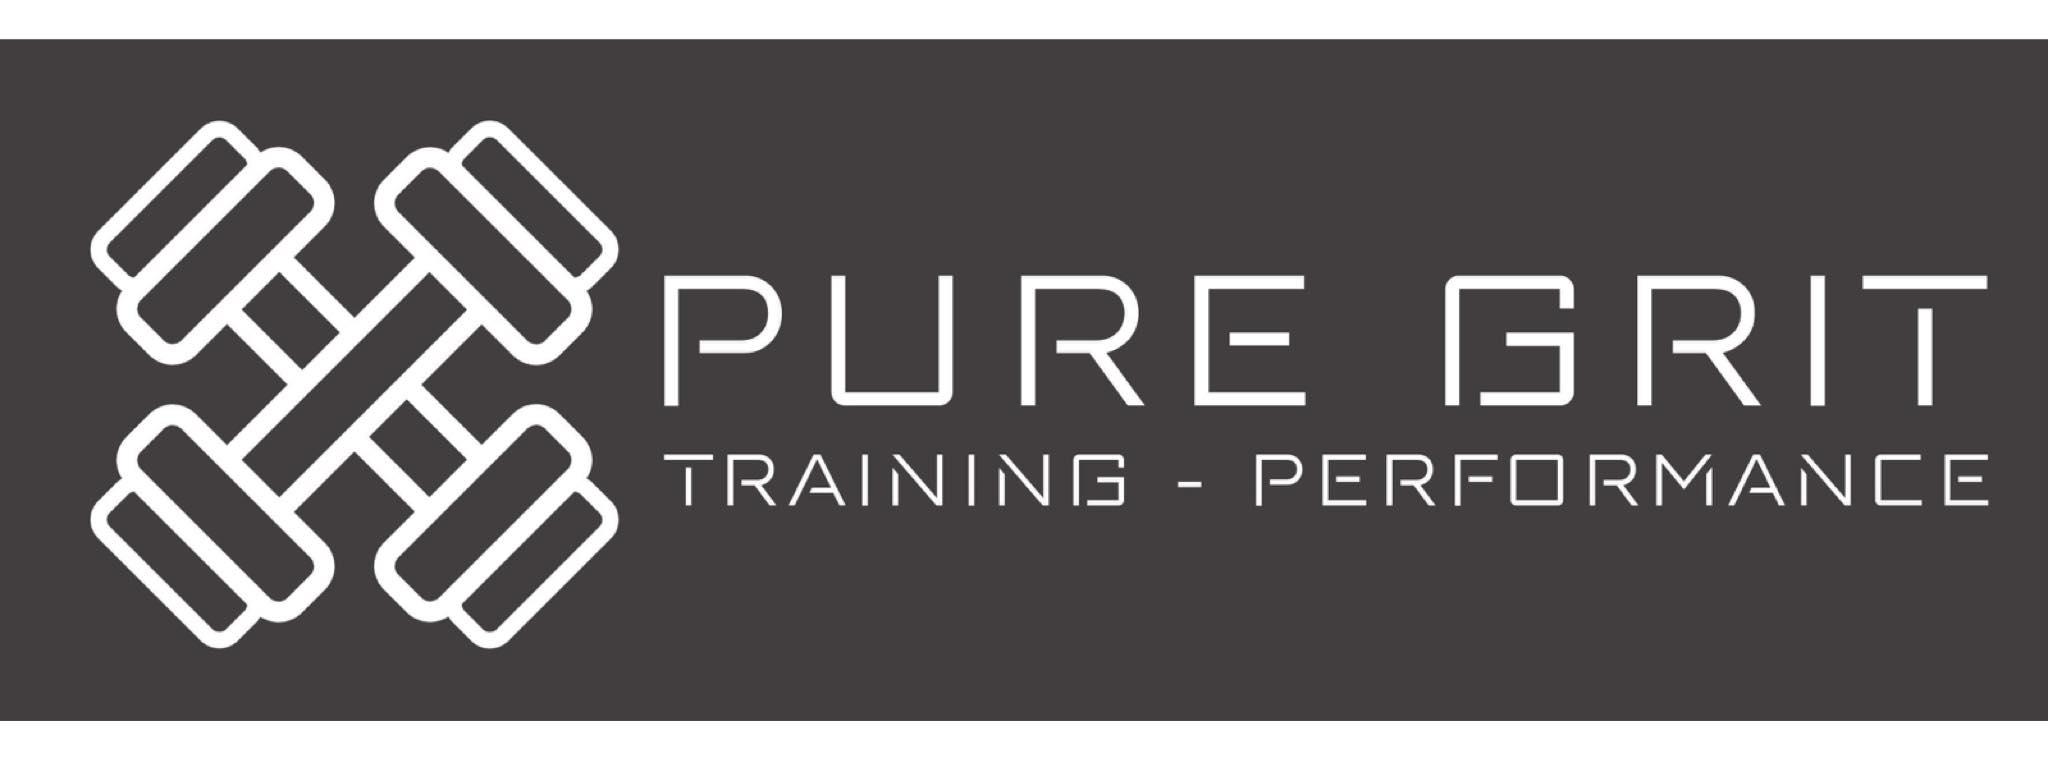 Pure Grit logo